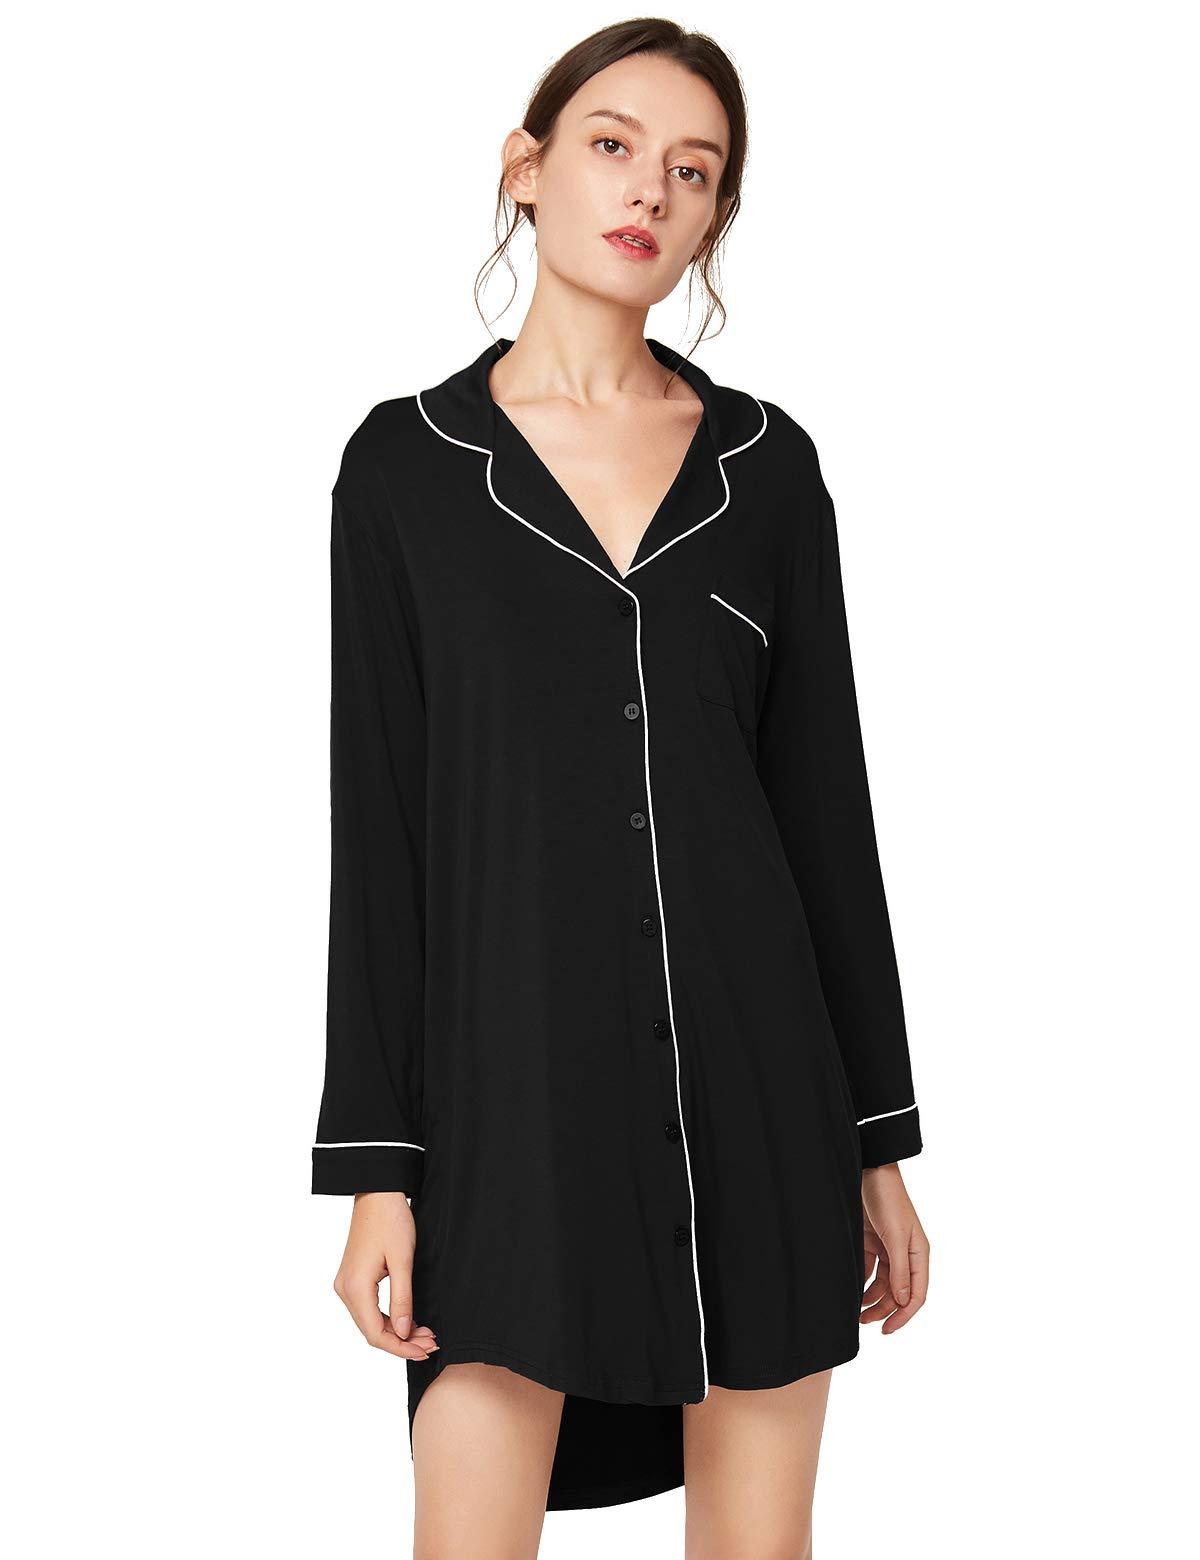 Escalier Women's Nightgown Button Down Nightshirt Long Sleeve Boyfriend Sleep Shirt Pajama Dress Sleepwear Nightdress